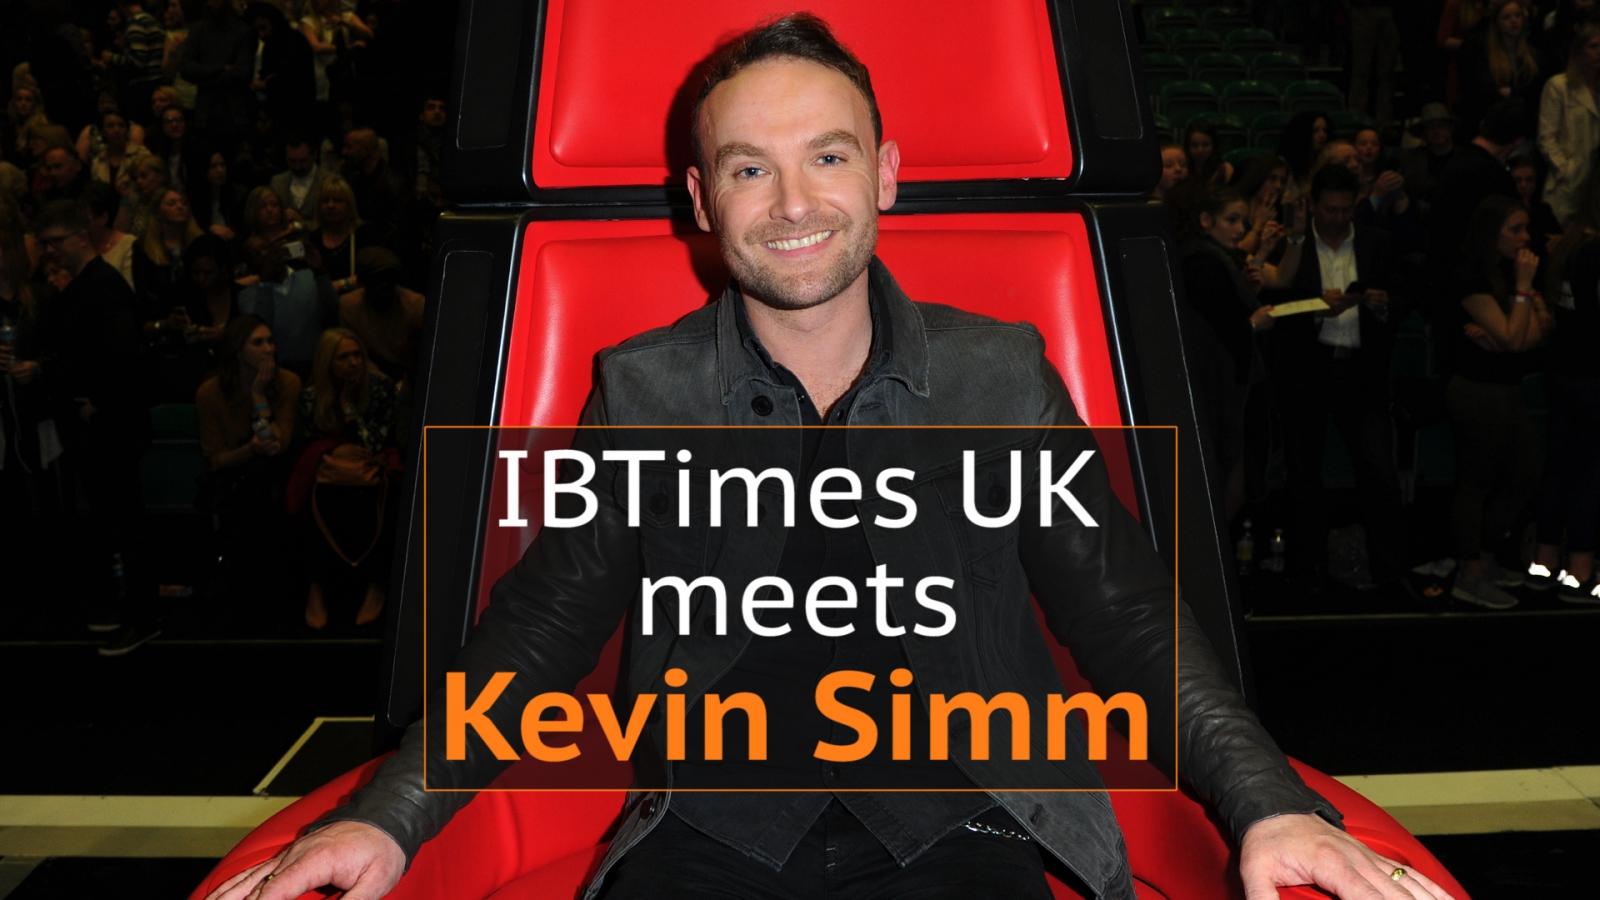 IBTimes UK meets Kevin Simm